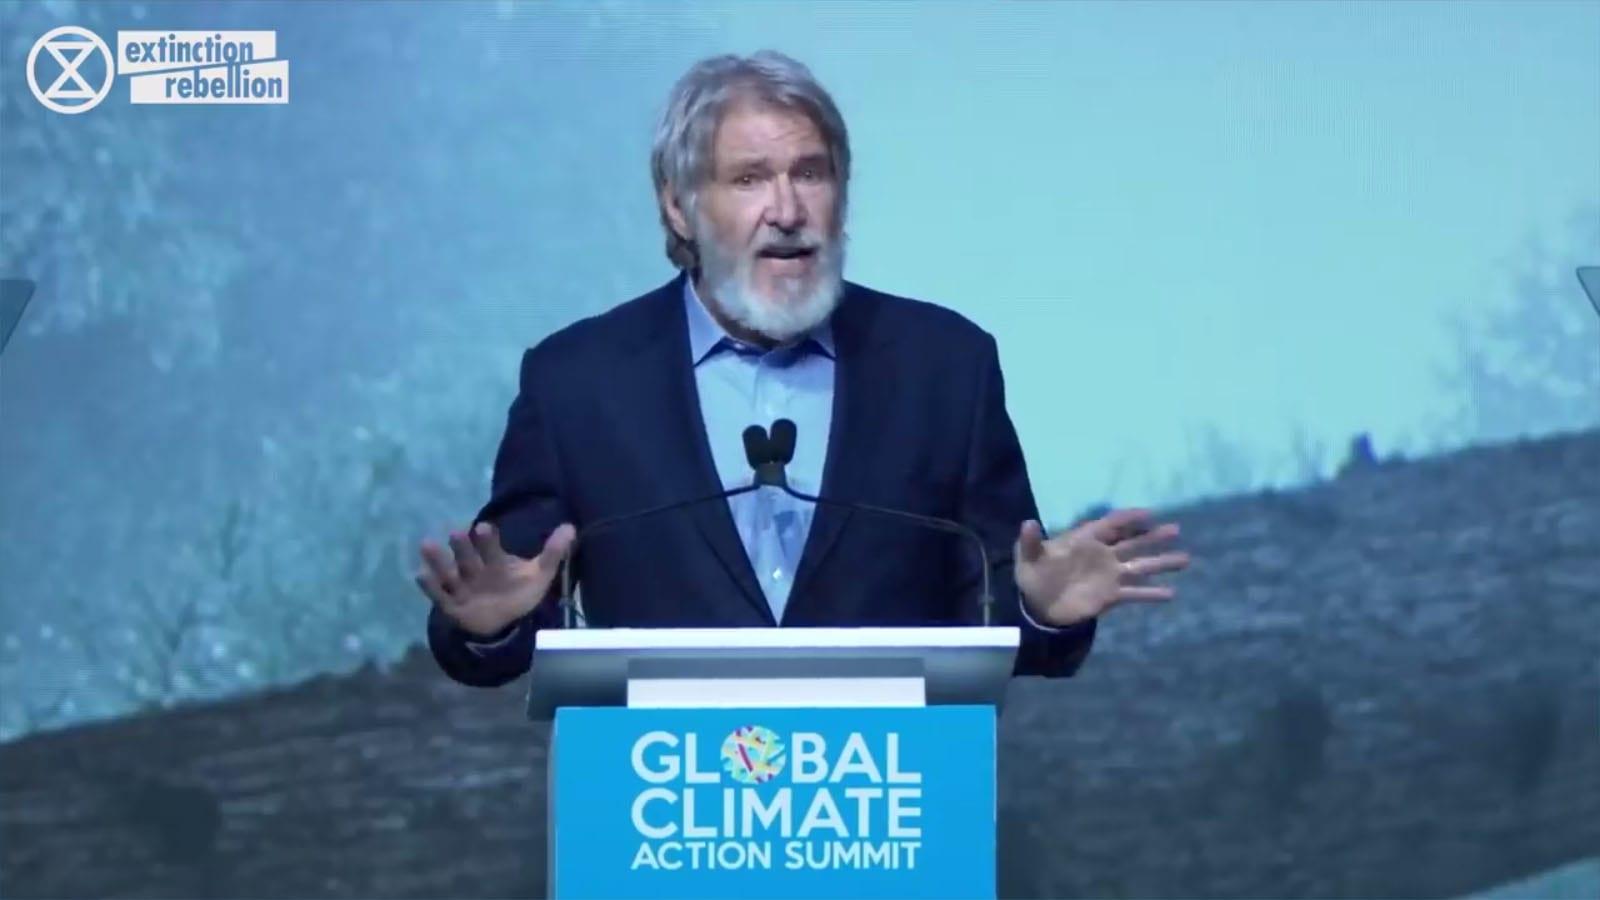 """Ha nem tudjuk megóvni a természetet, nem tudjuk megóvni magunkat"" Harrison Ford"